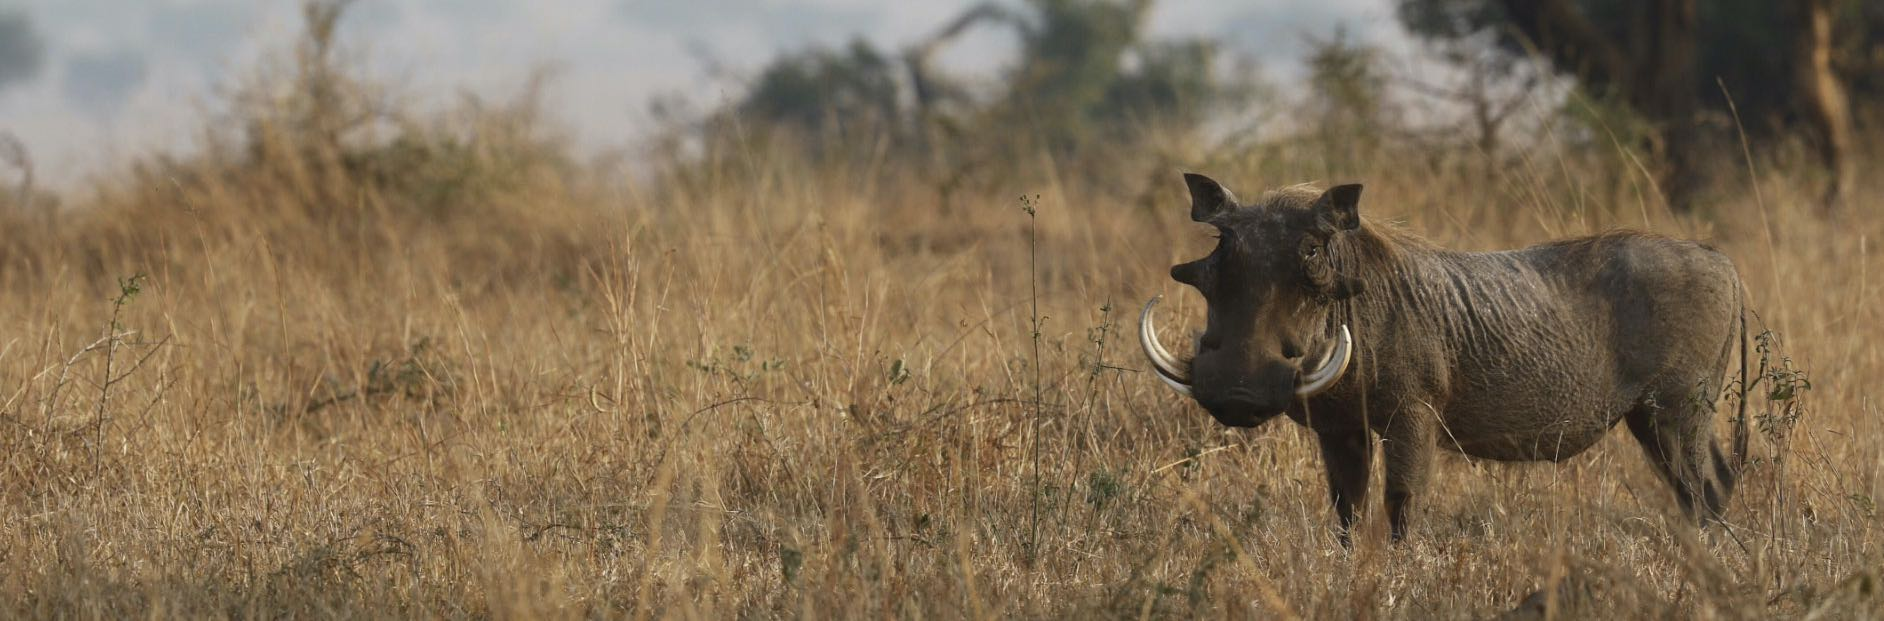 warthog-plains-bush-game-hunting-africa.